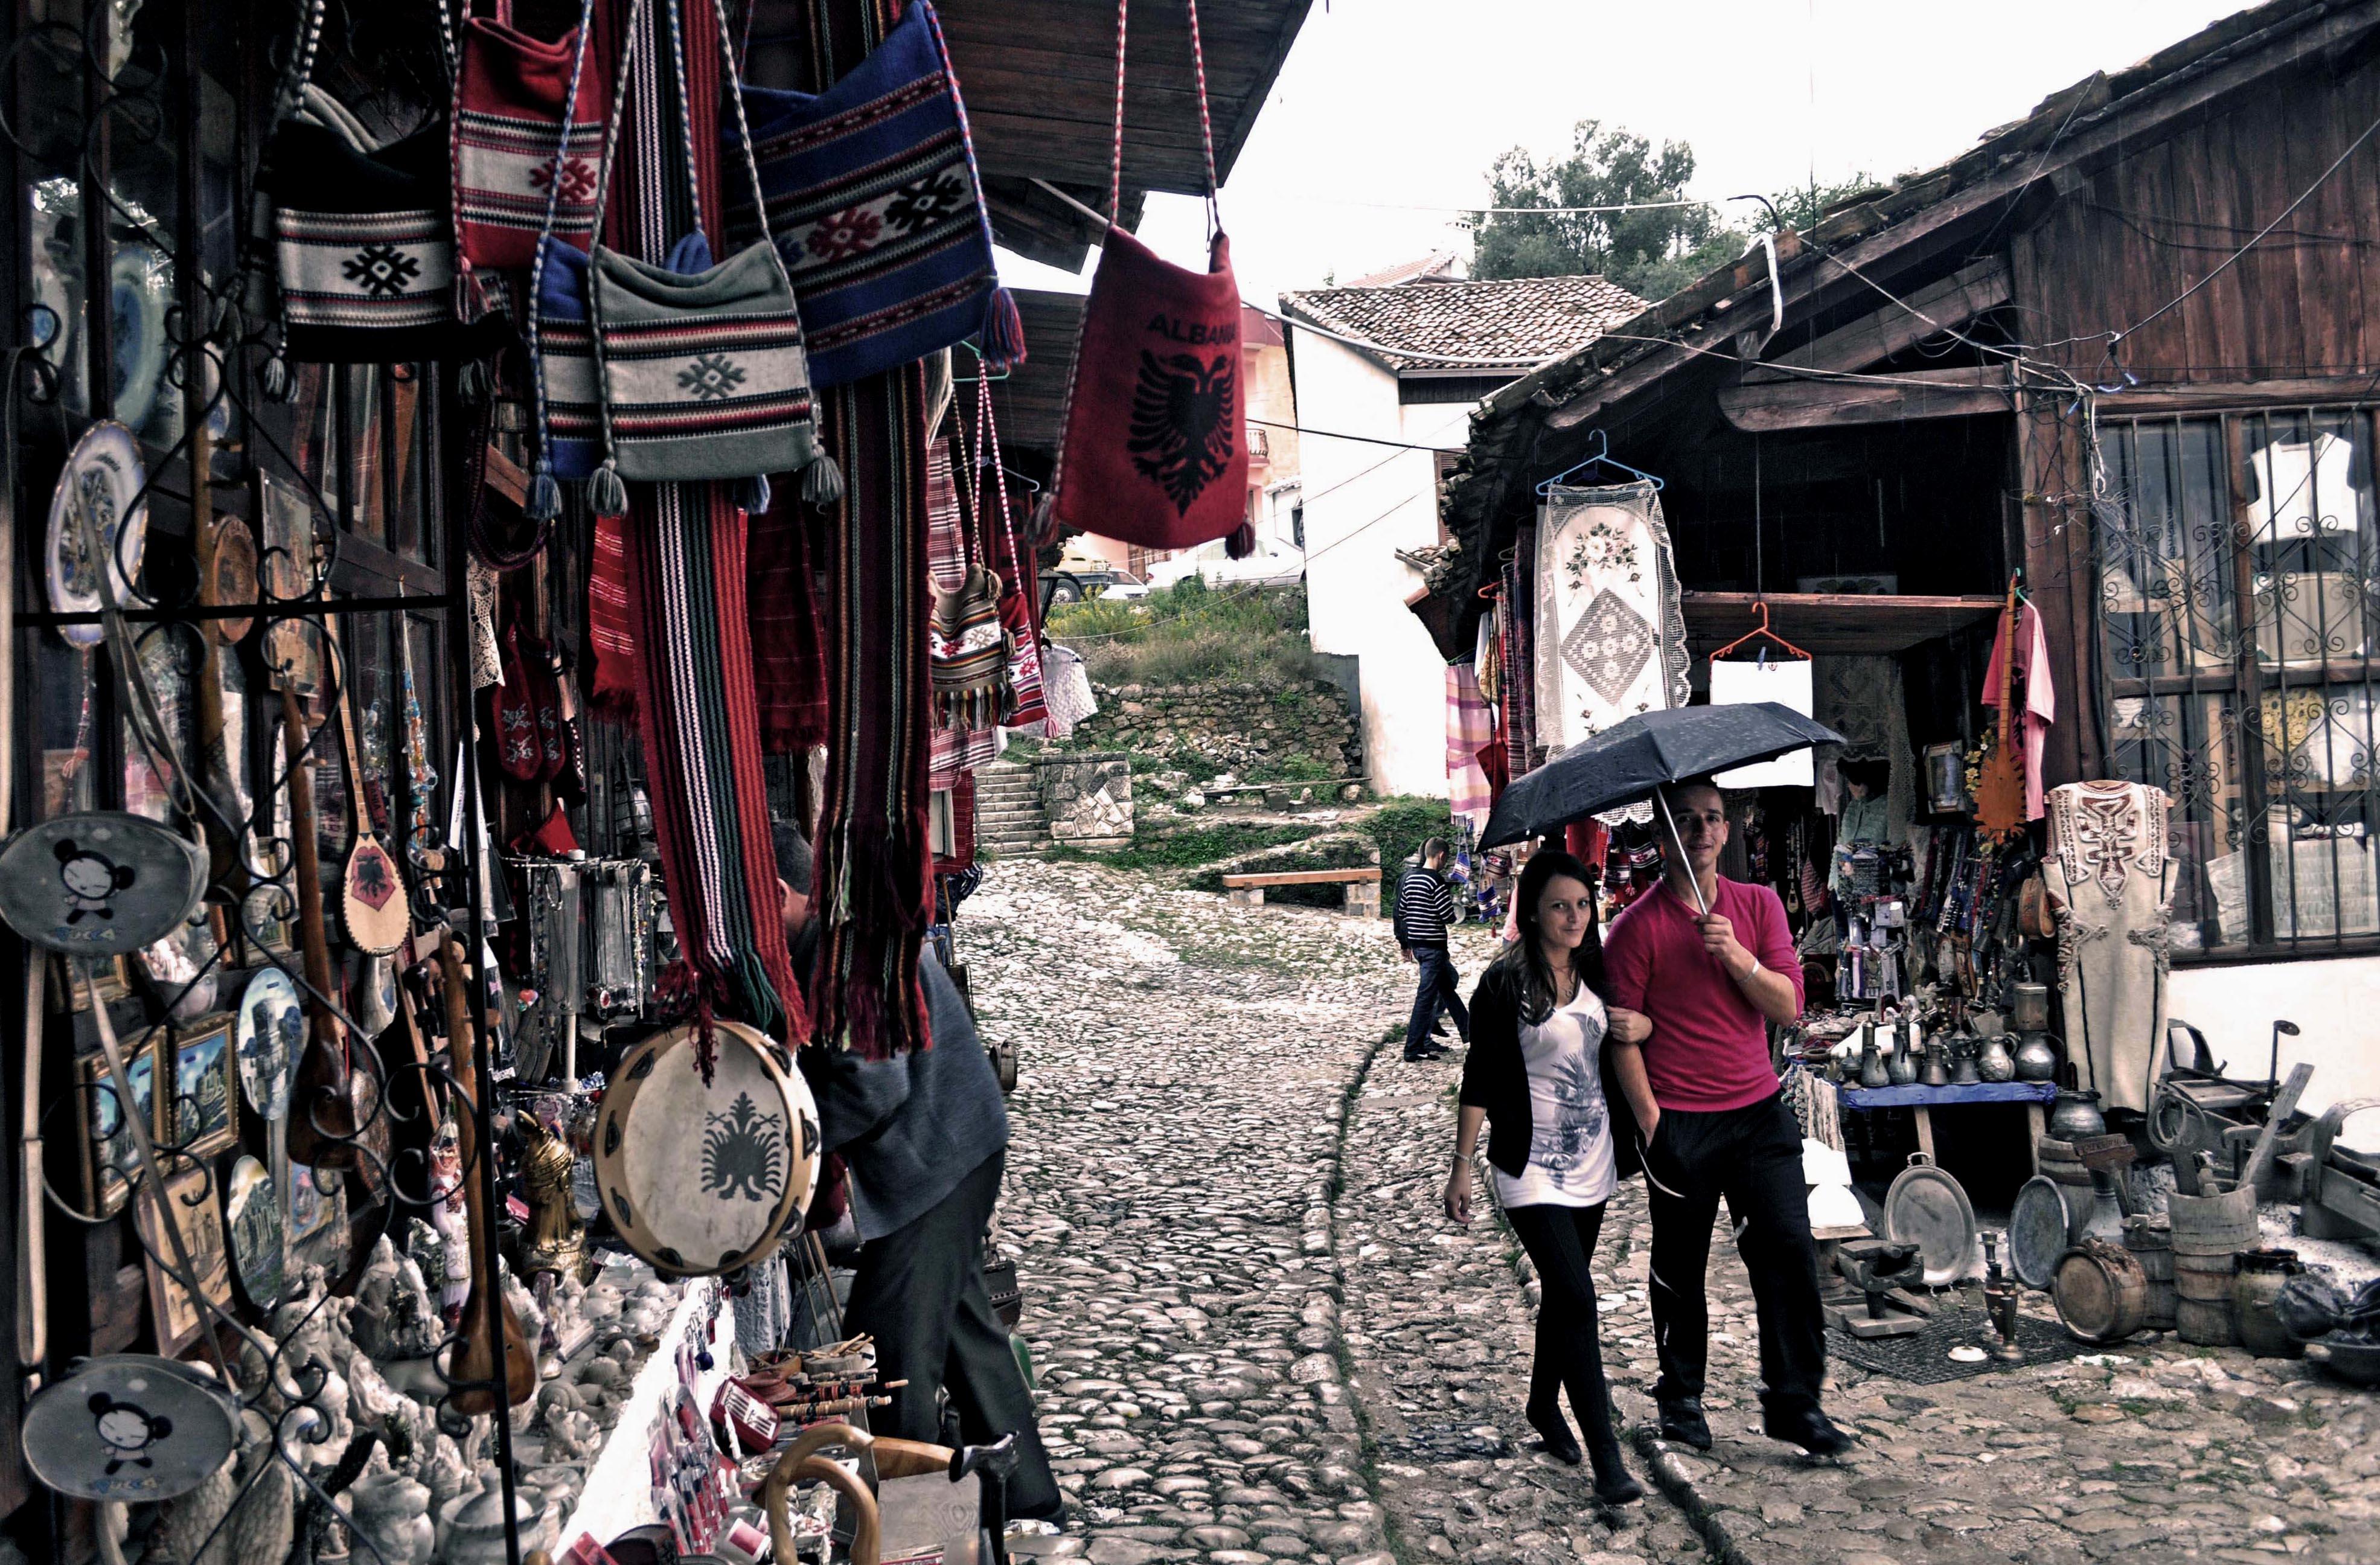 Il bazar di Kruja - foto di Marjola Rukaj